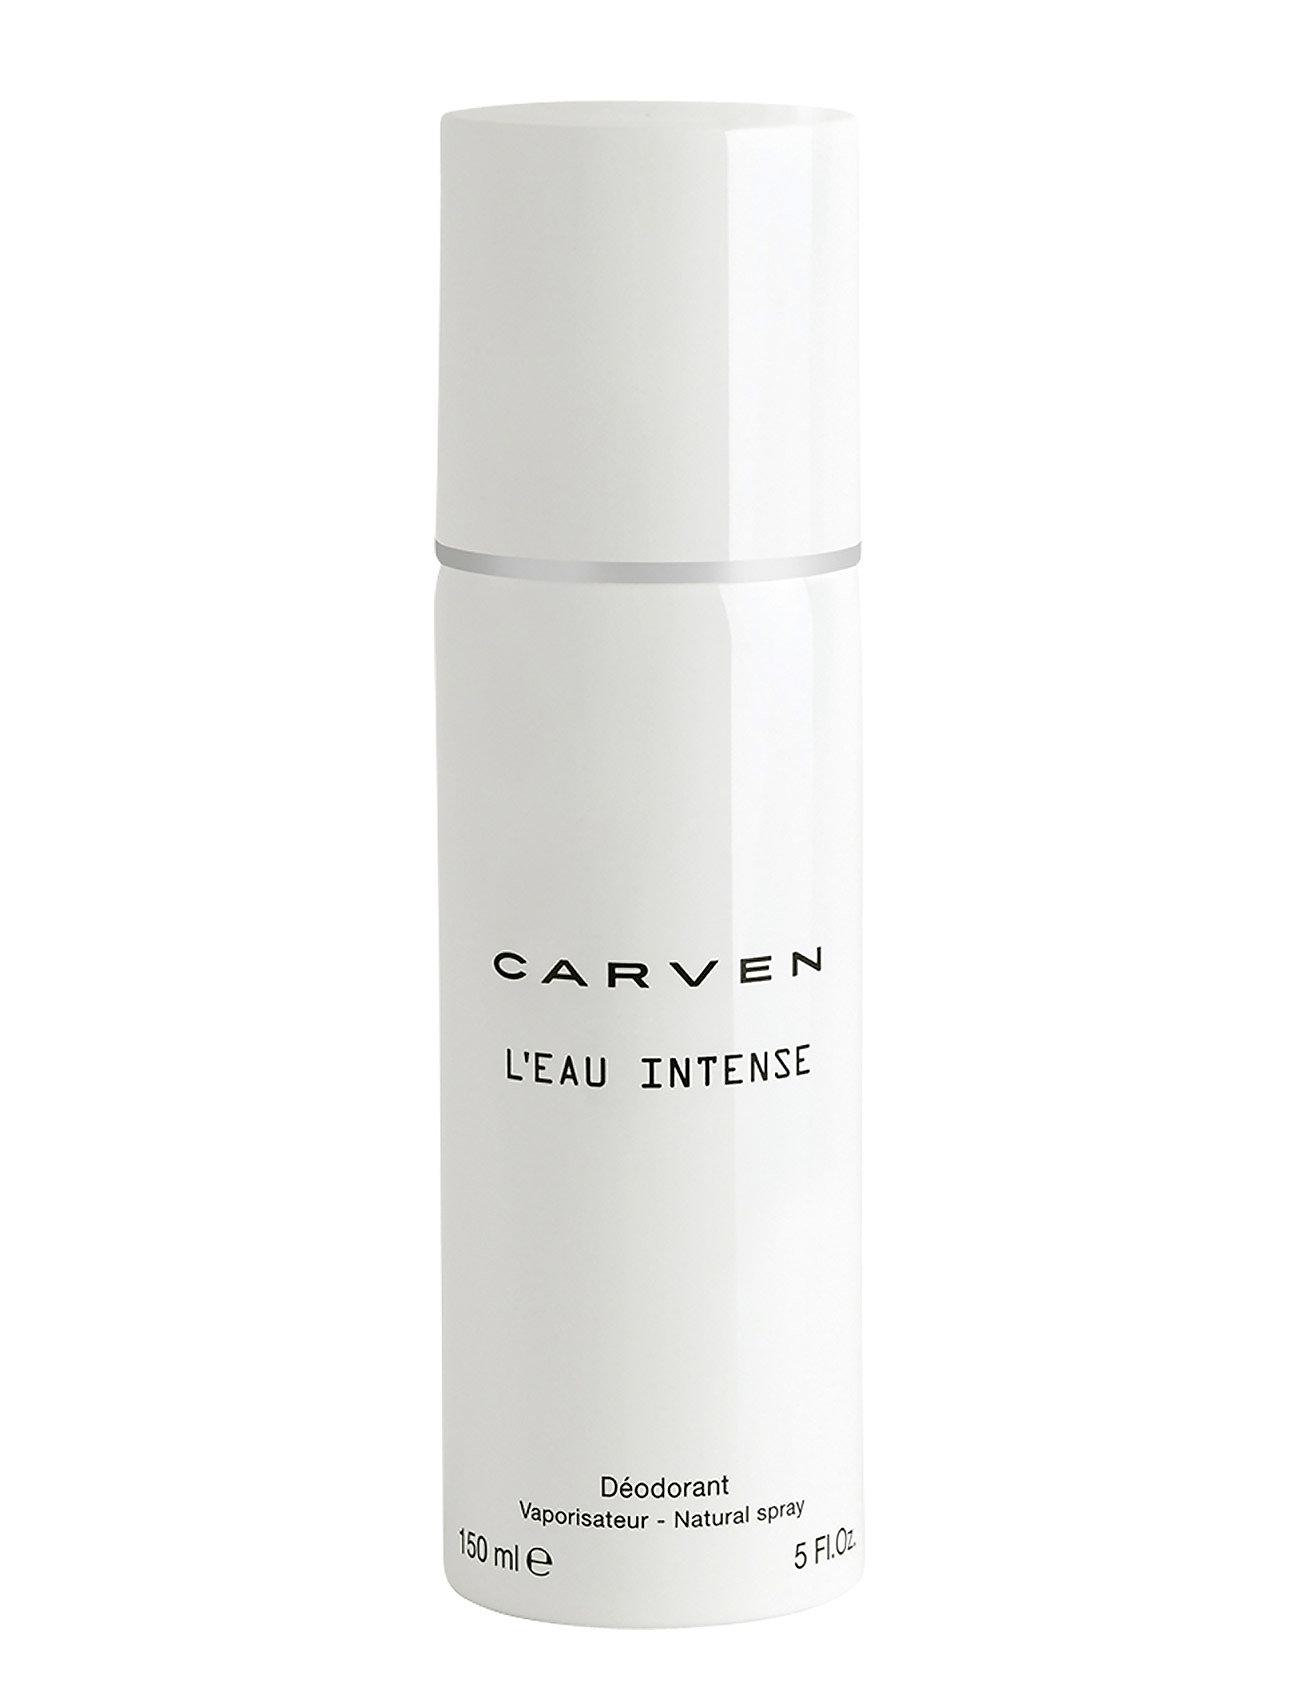 Carven L'Eau Intense Deodorant 150mL - CLEAR